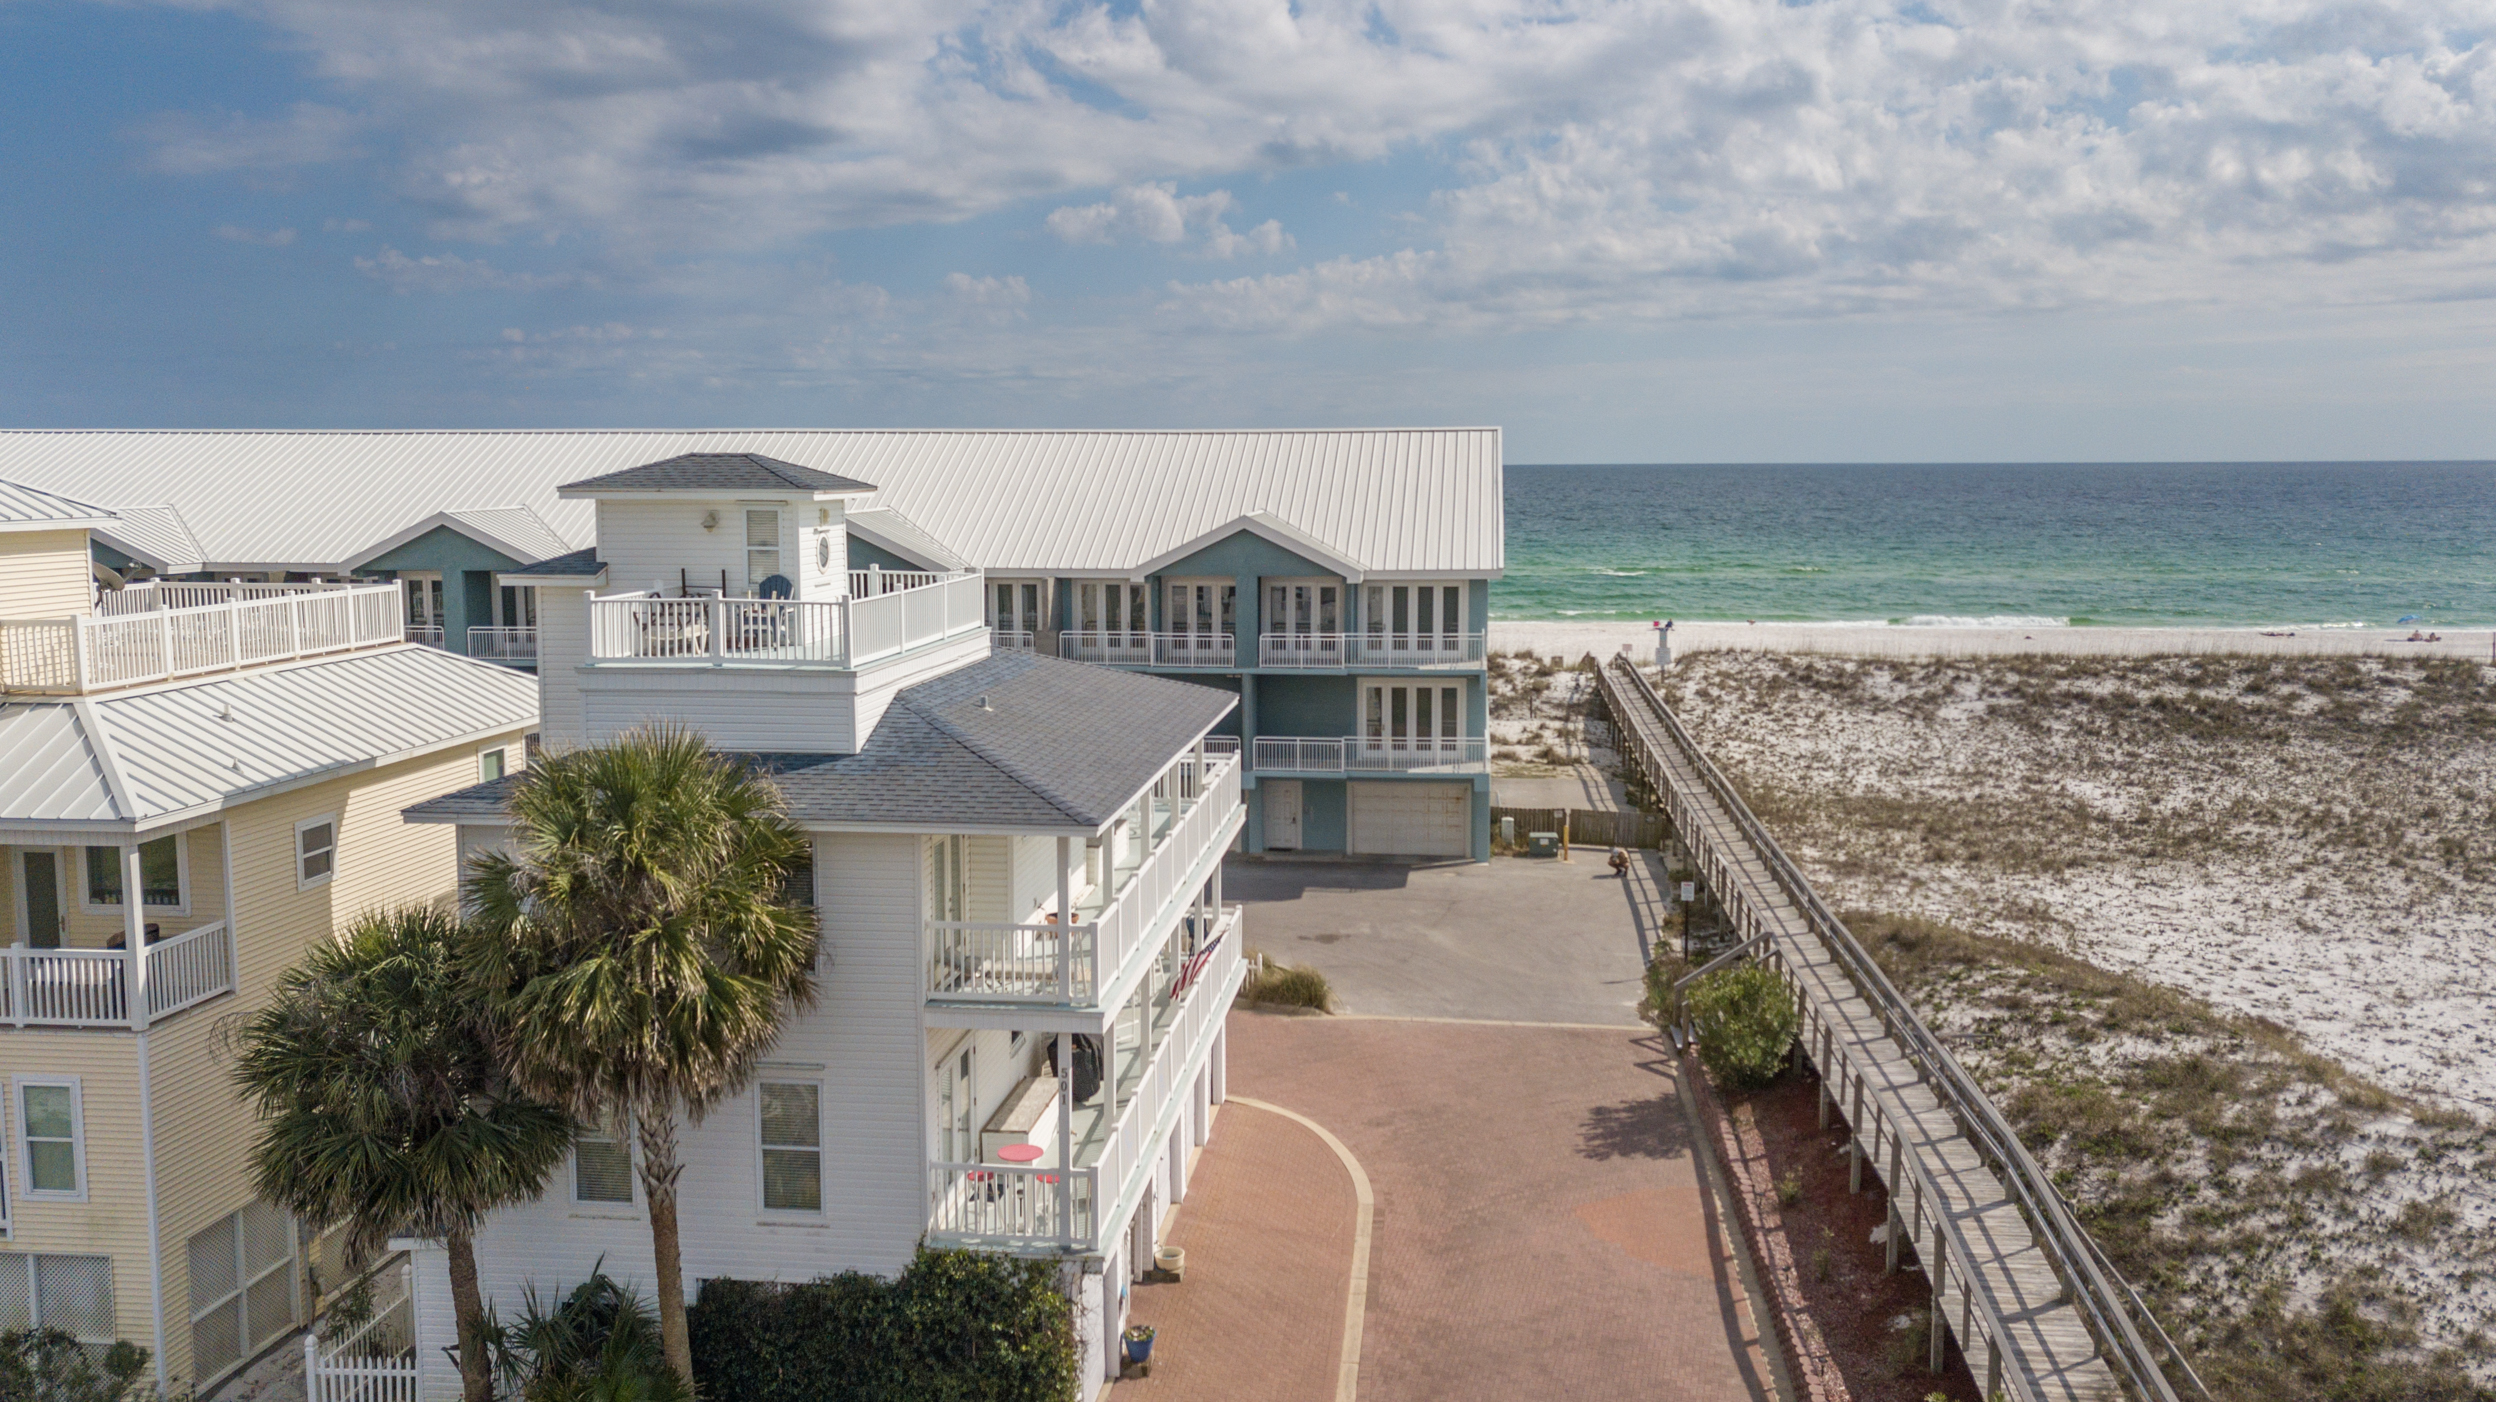 White Sands Cottage 501 Life's a Beach House Townhouse rental in White Sands Pensacola Beach in Pensacola Beach Florida - #48